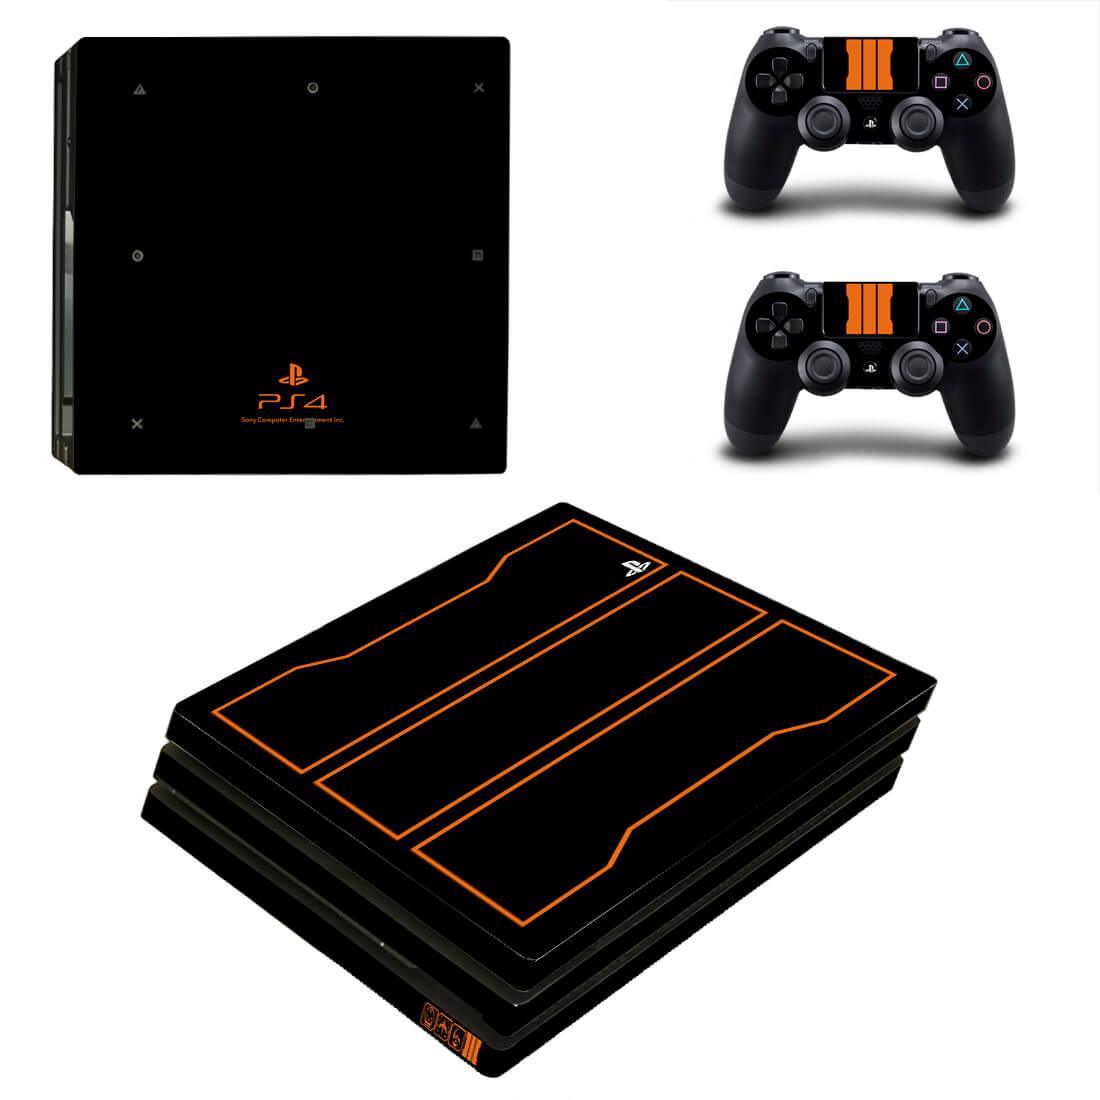 COD Black Ops 3 PS4 Pro Skin